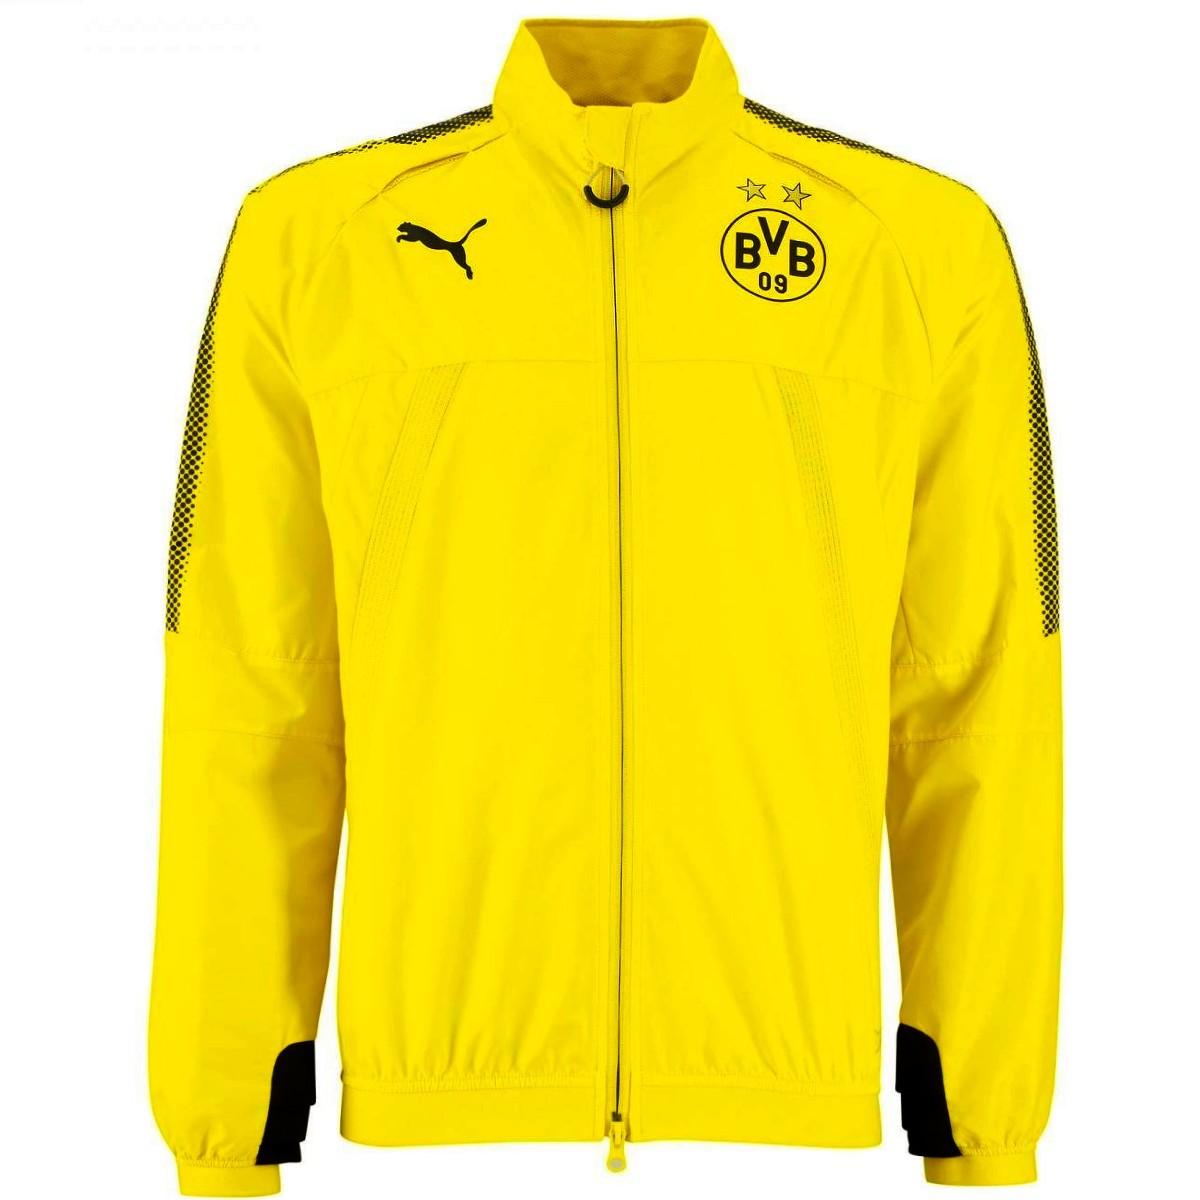 Bvb Borussia Dortmund Training Rain Jacket 2017 18 Puma Sportingplus Net